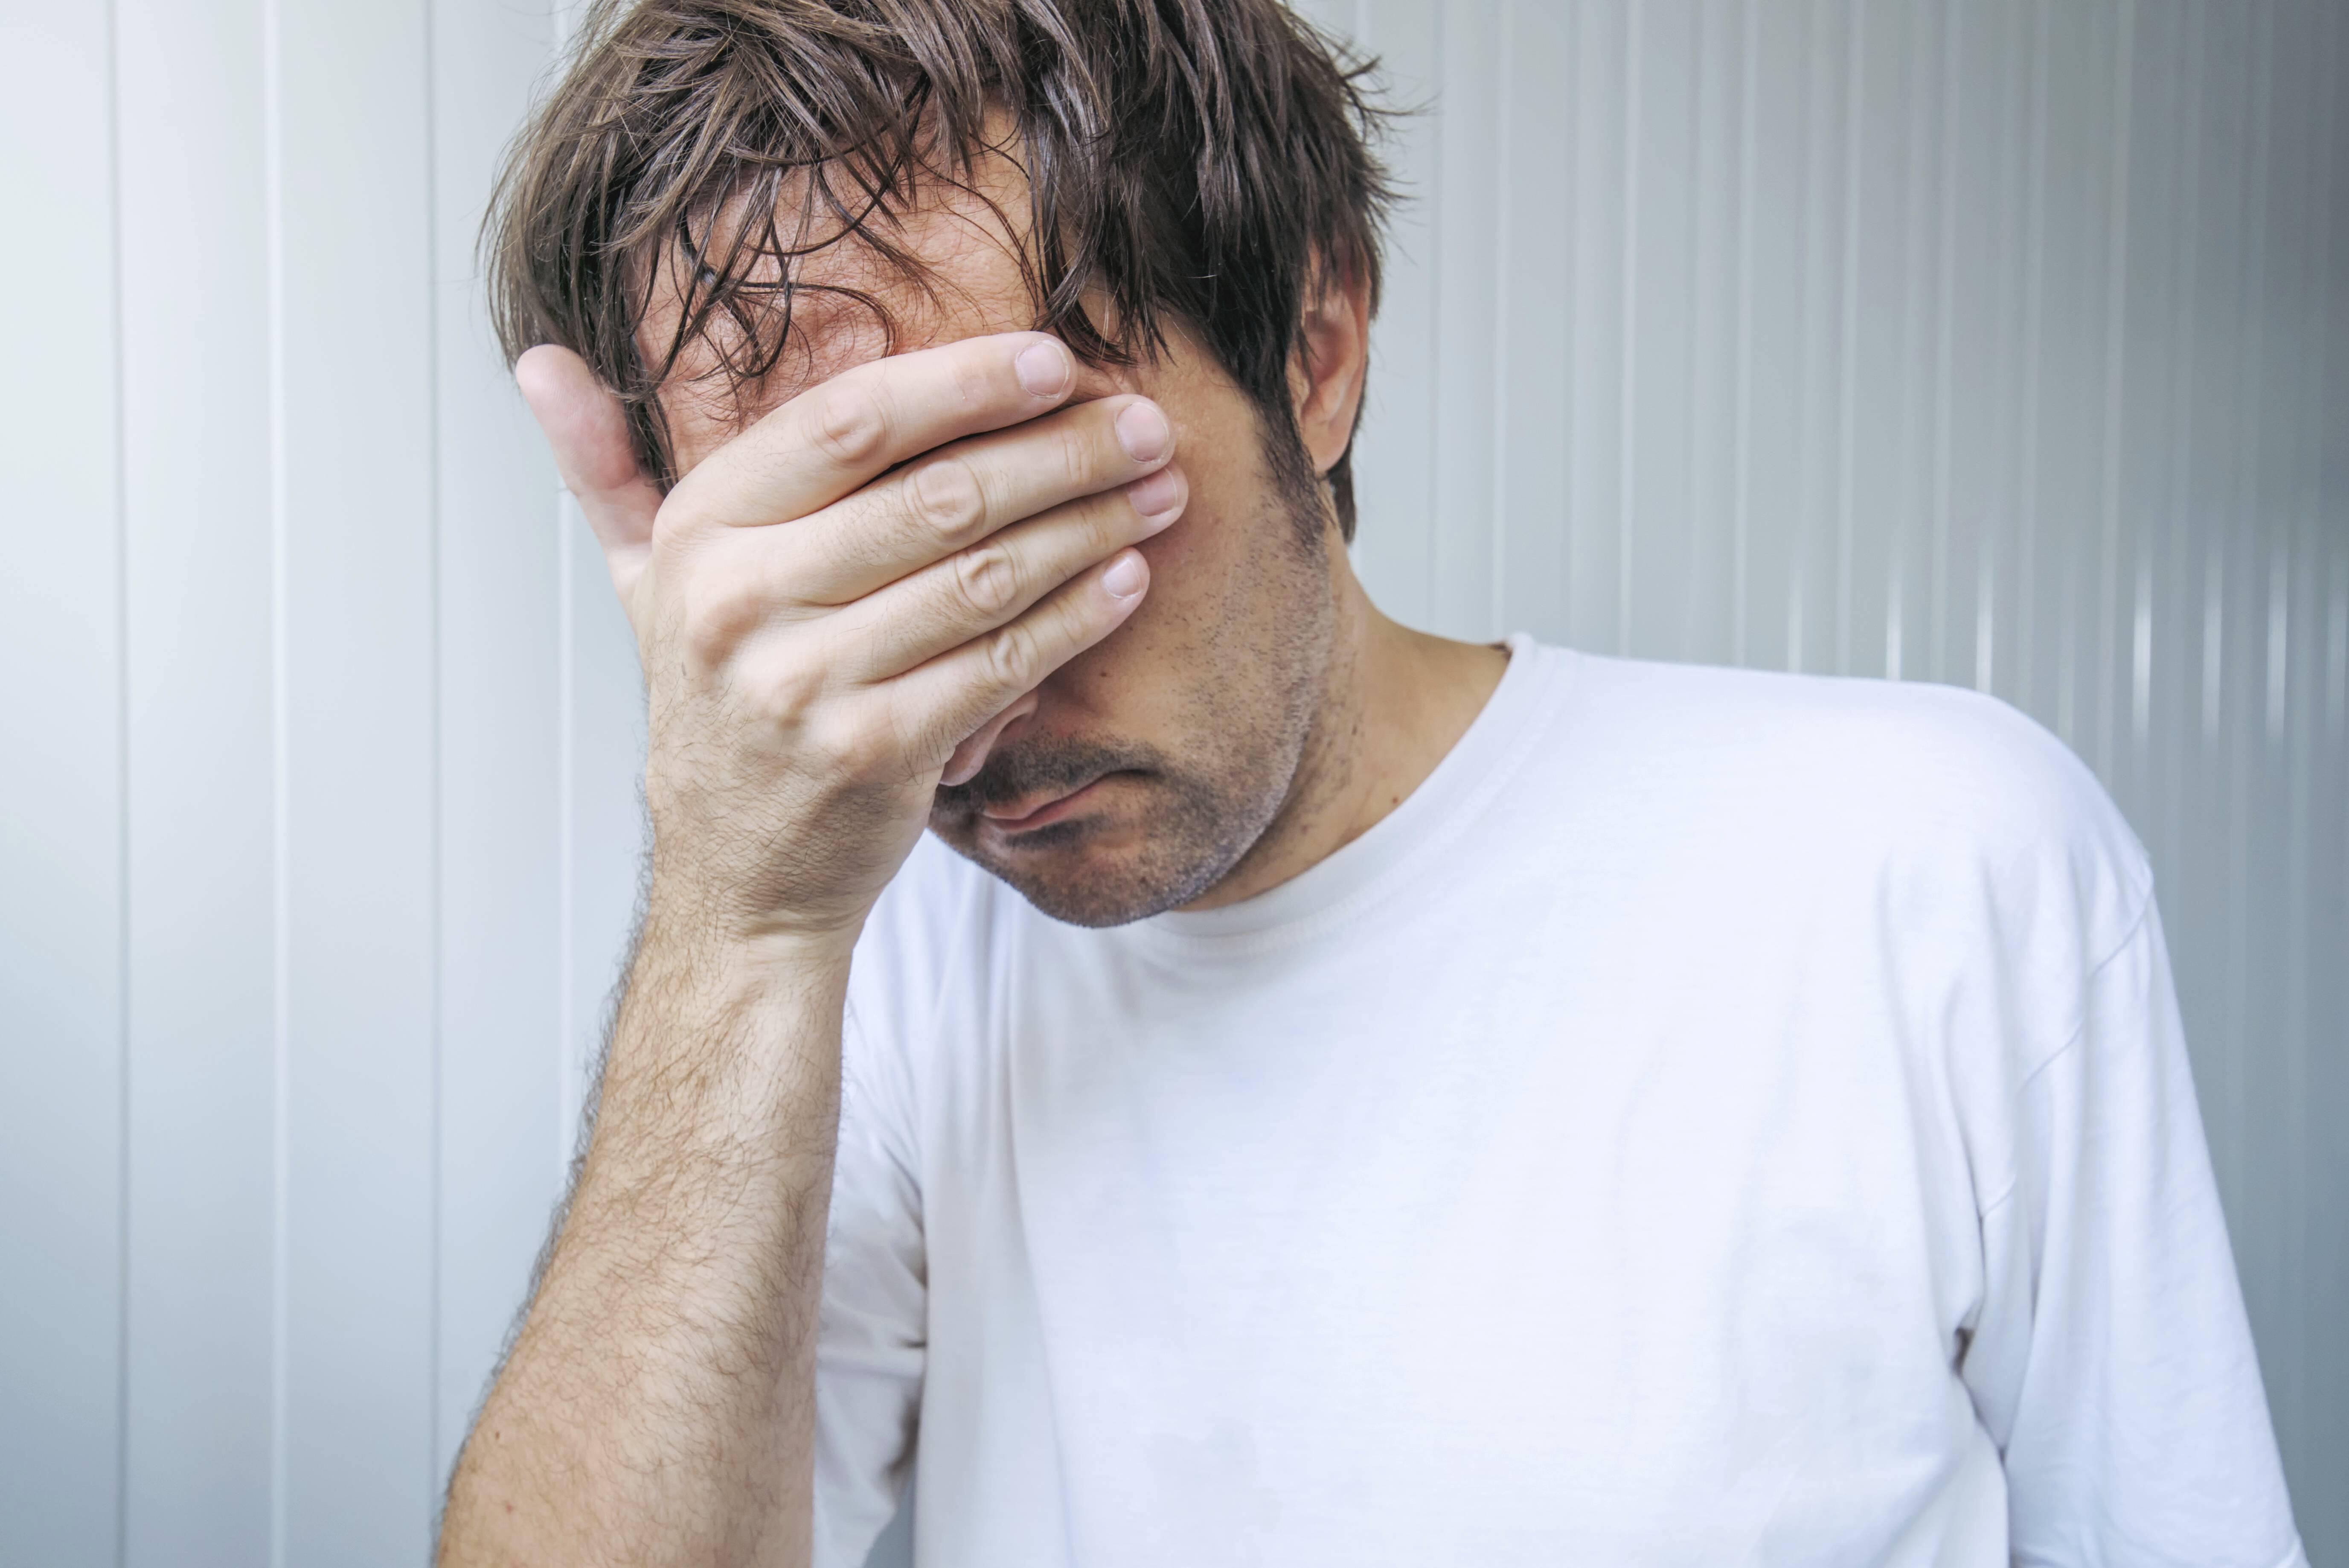 Bild zu Depression, Stress, Krankheit